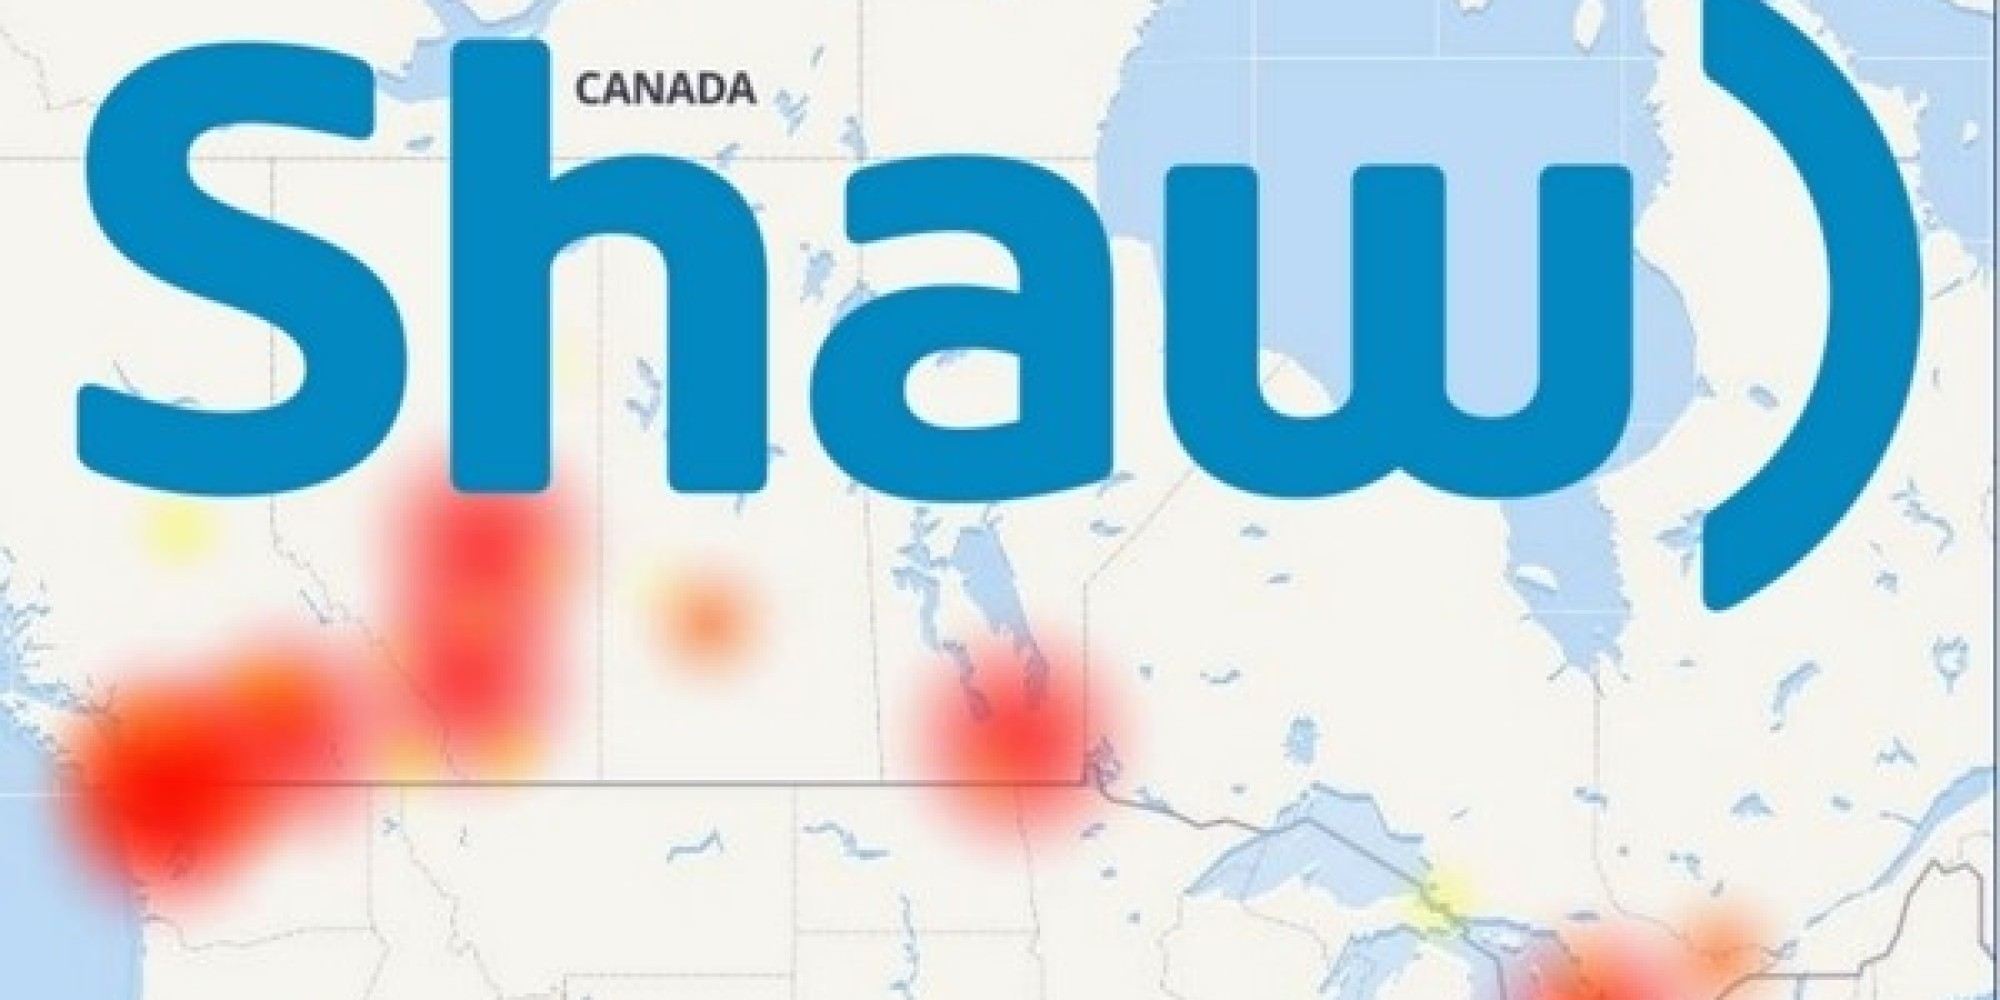 shaw home internet